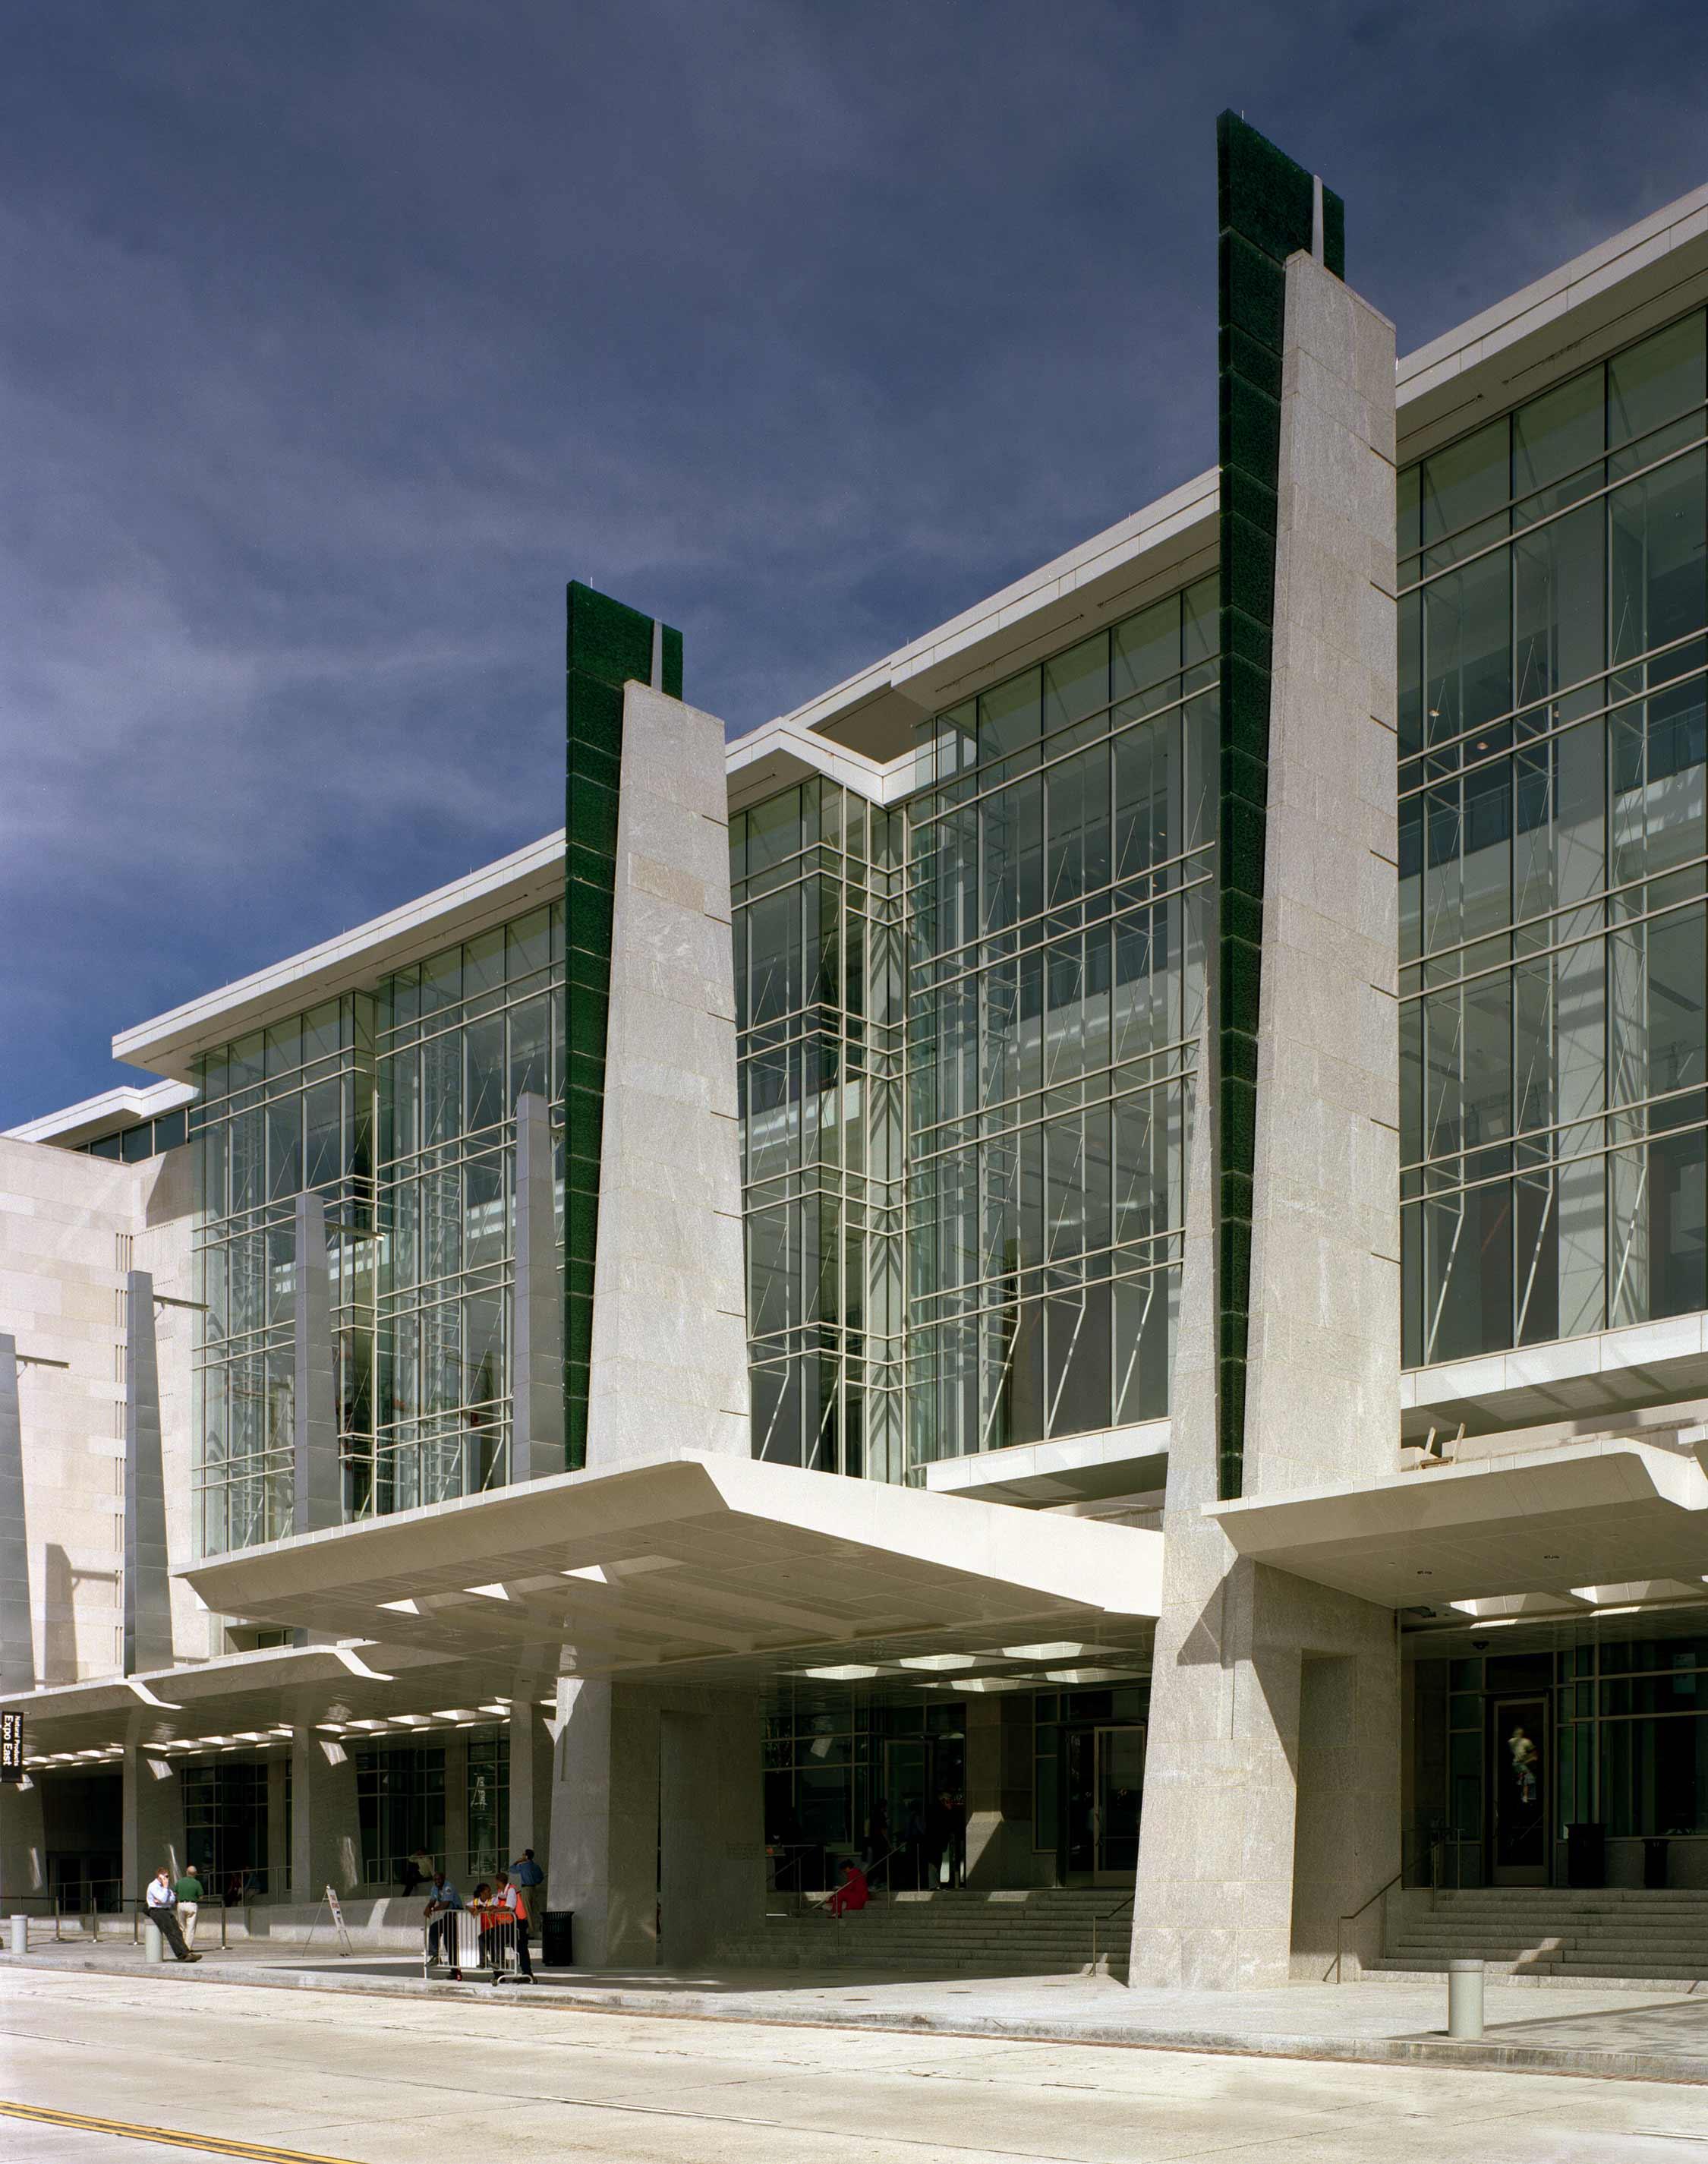 Convention-Center-003-Exterior-3c.jpg